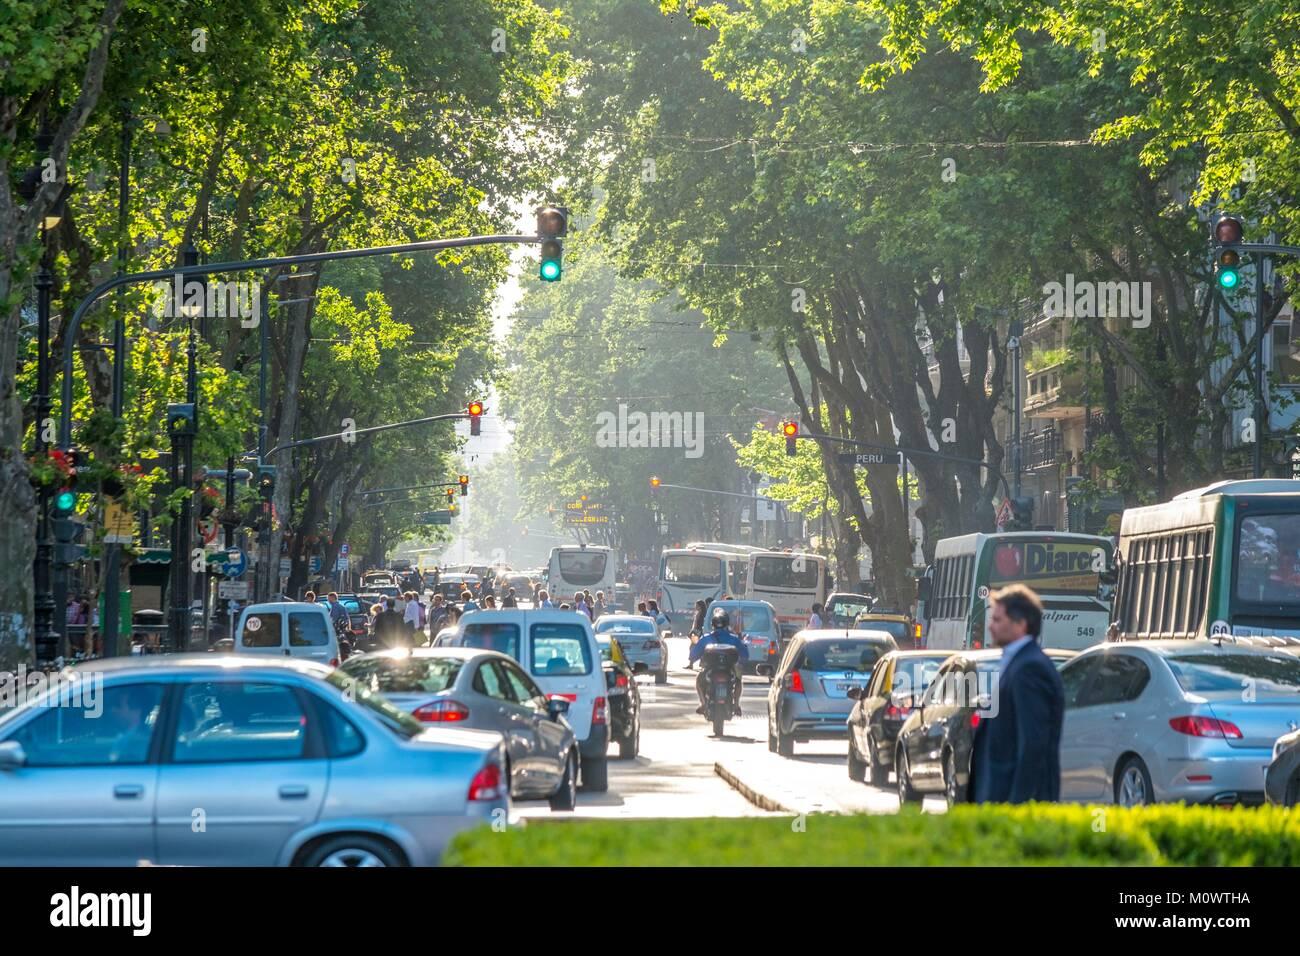 L'Argentina,provincia di Buenos Aires,Buenos Aires,Avenida de Mayo Immagini Stock